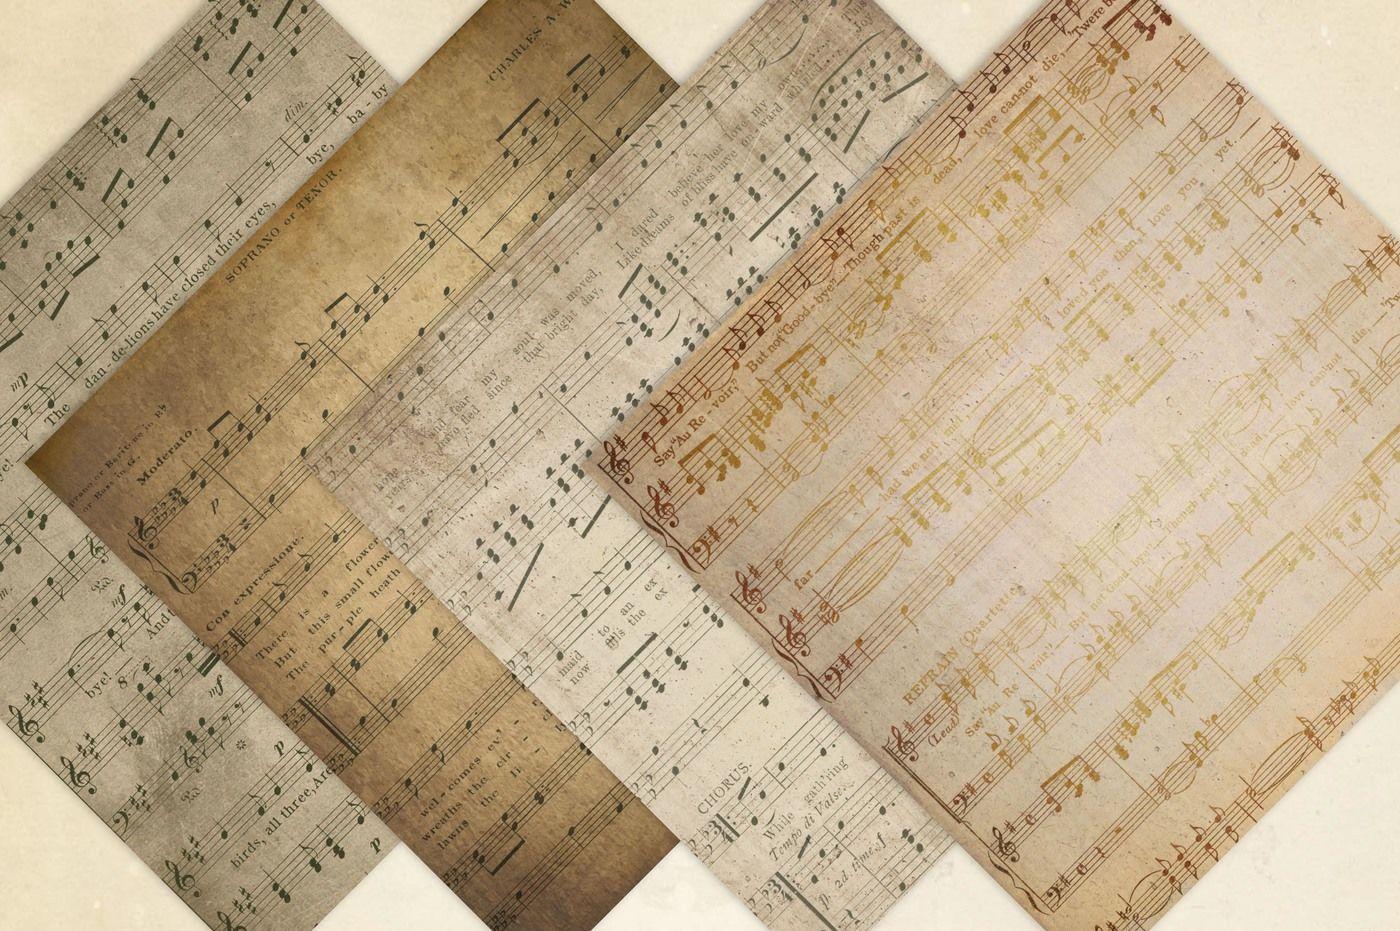 Vintage Sheet Music Digital Paper By Leska's Digitals